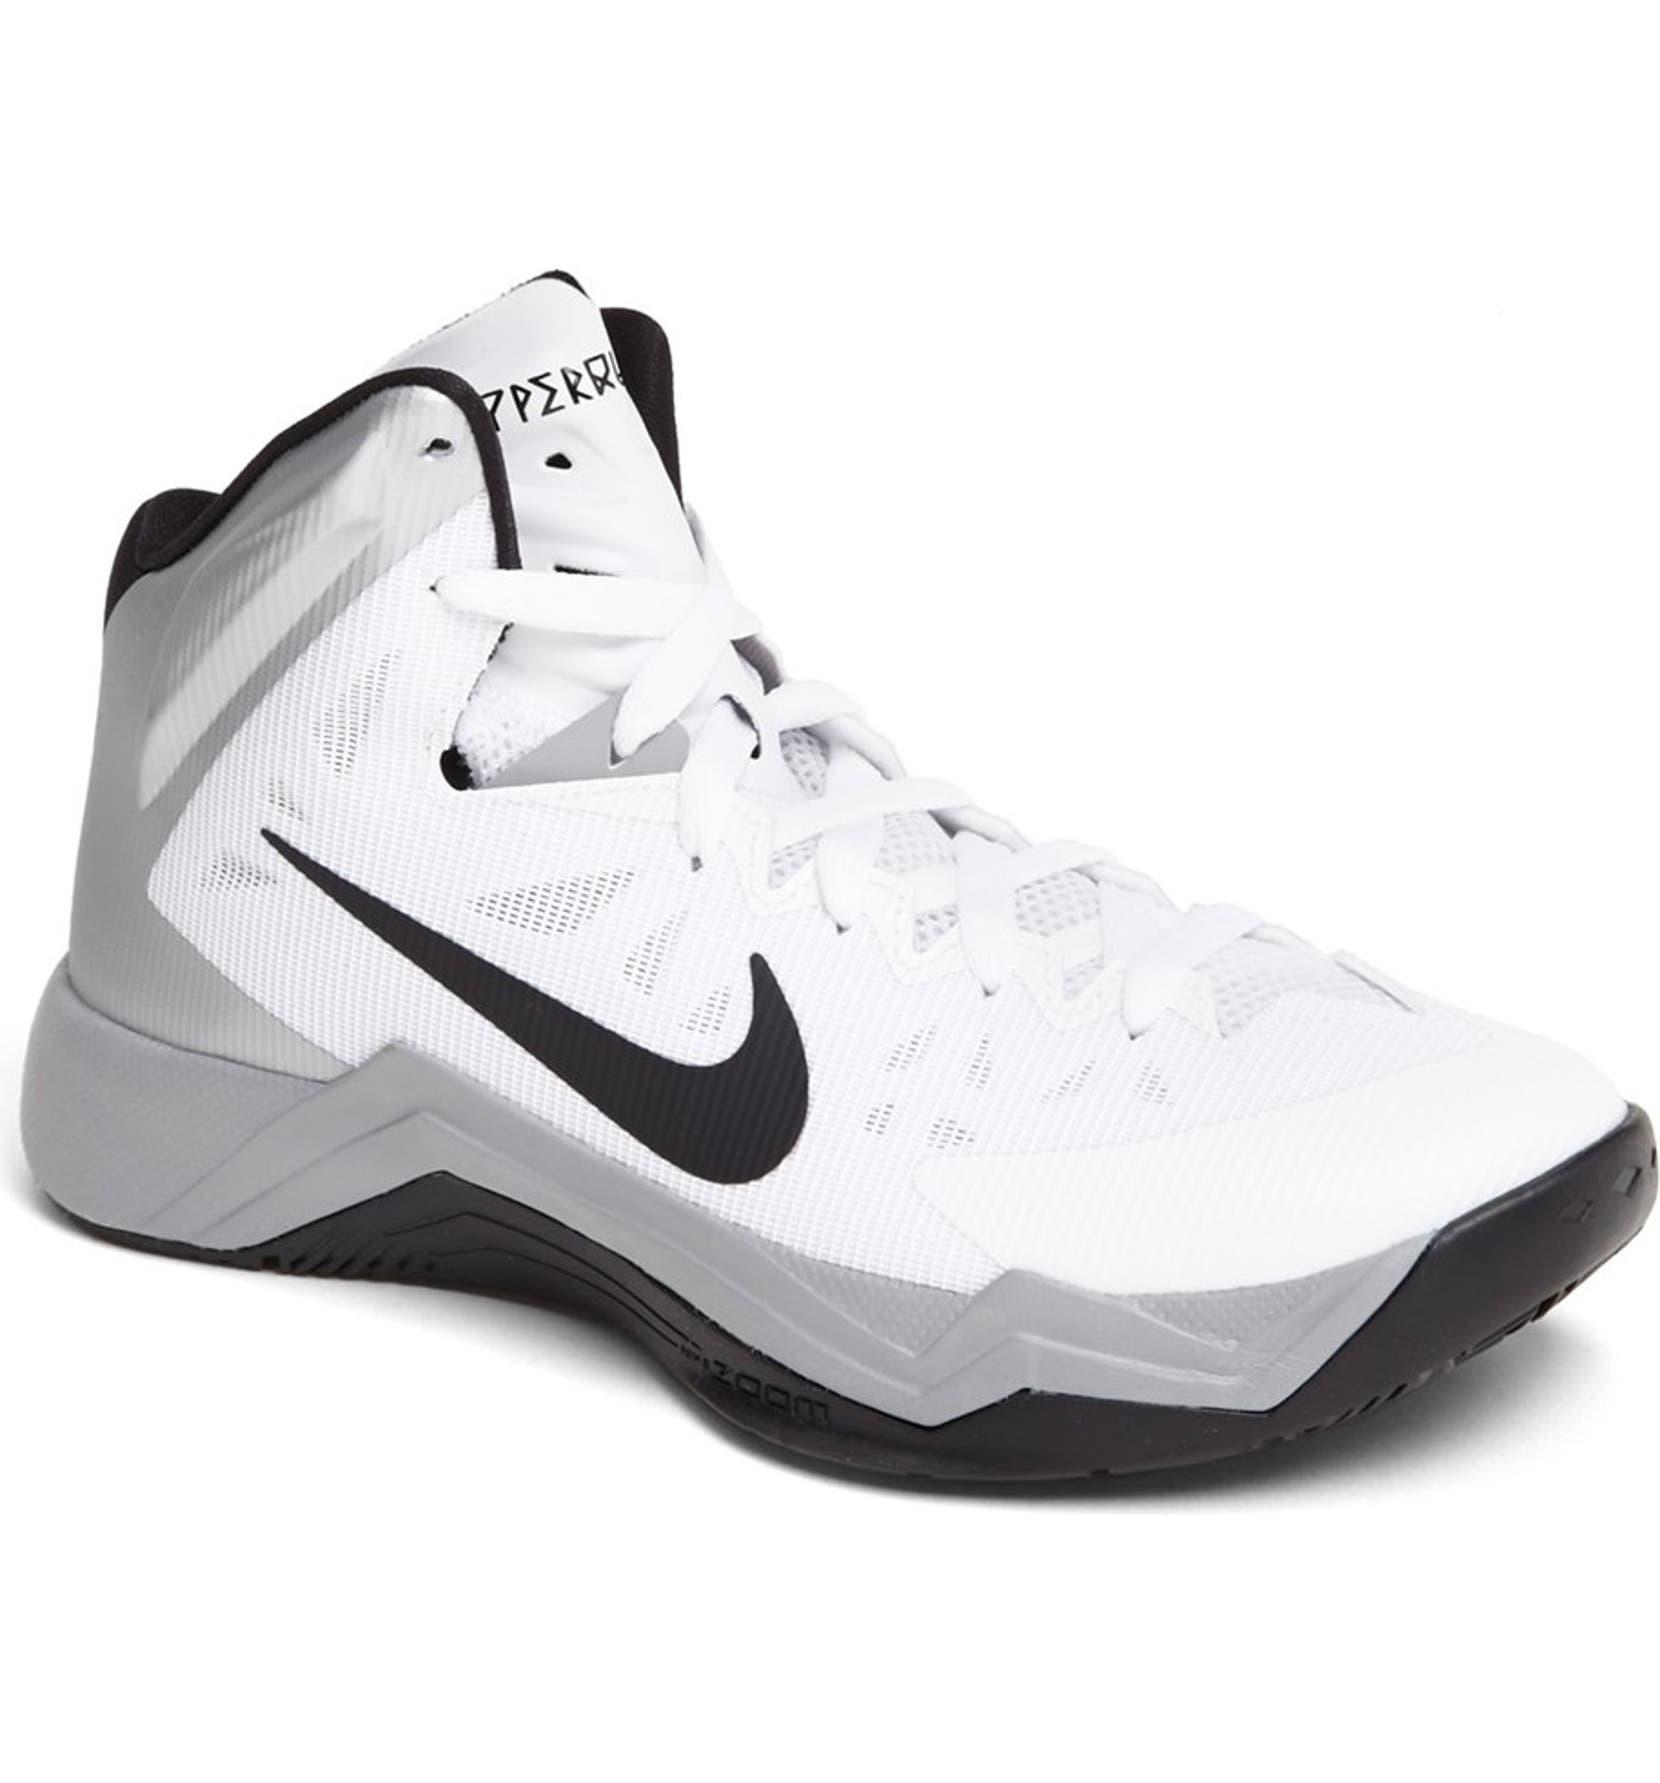 promo code a991e 702ae Nike  Hyper Quickness TB  Basketball Shoe (Women)   Nordstrom